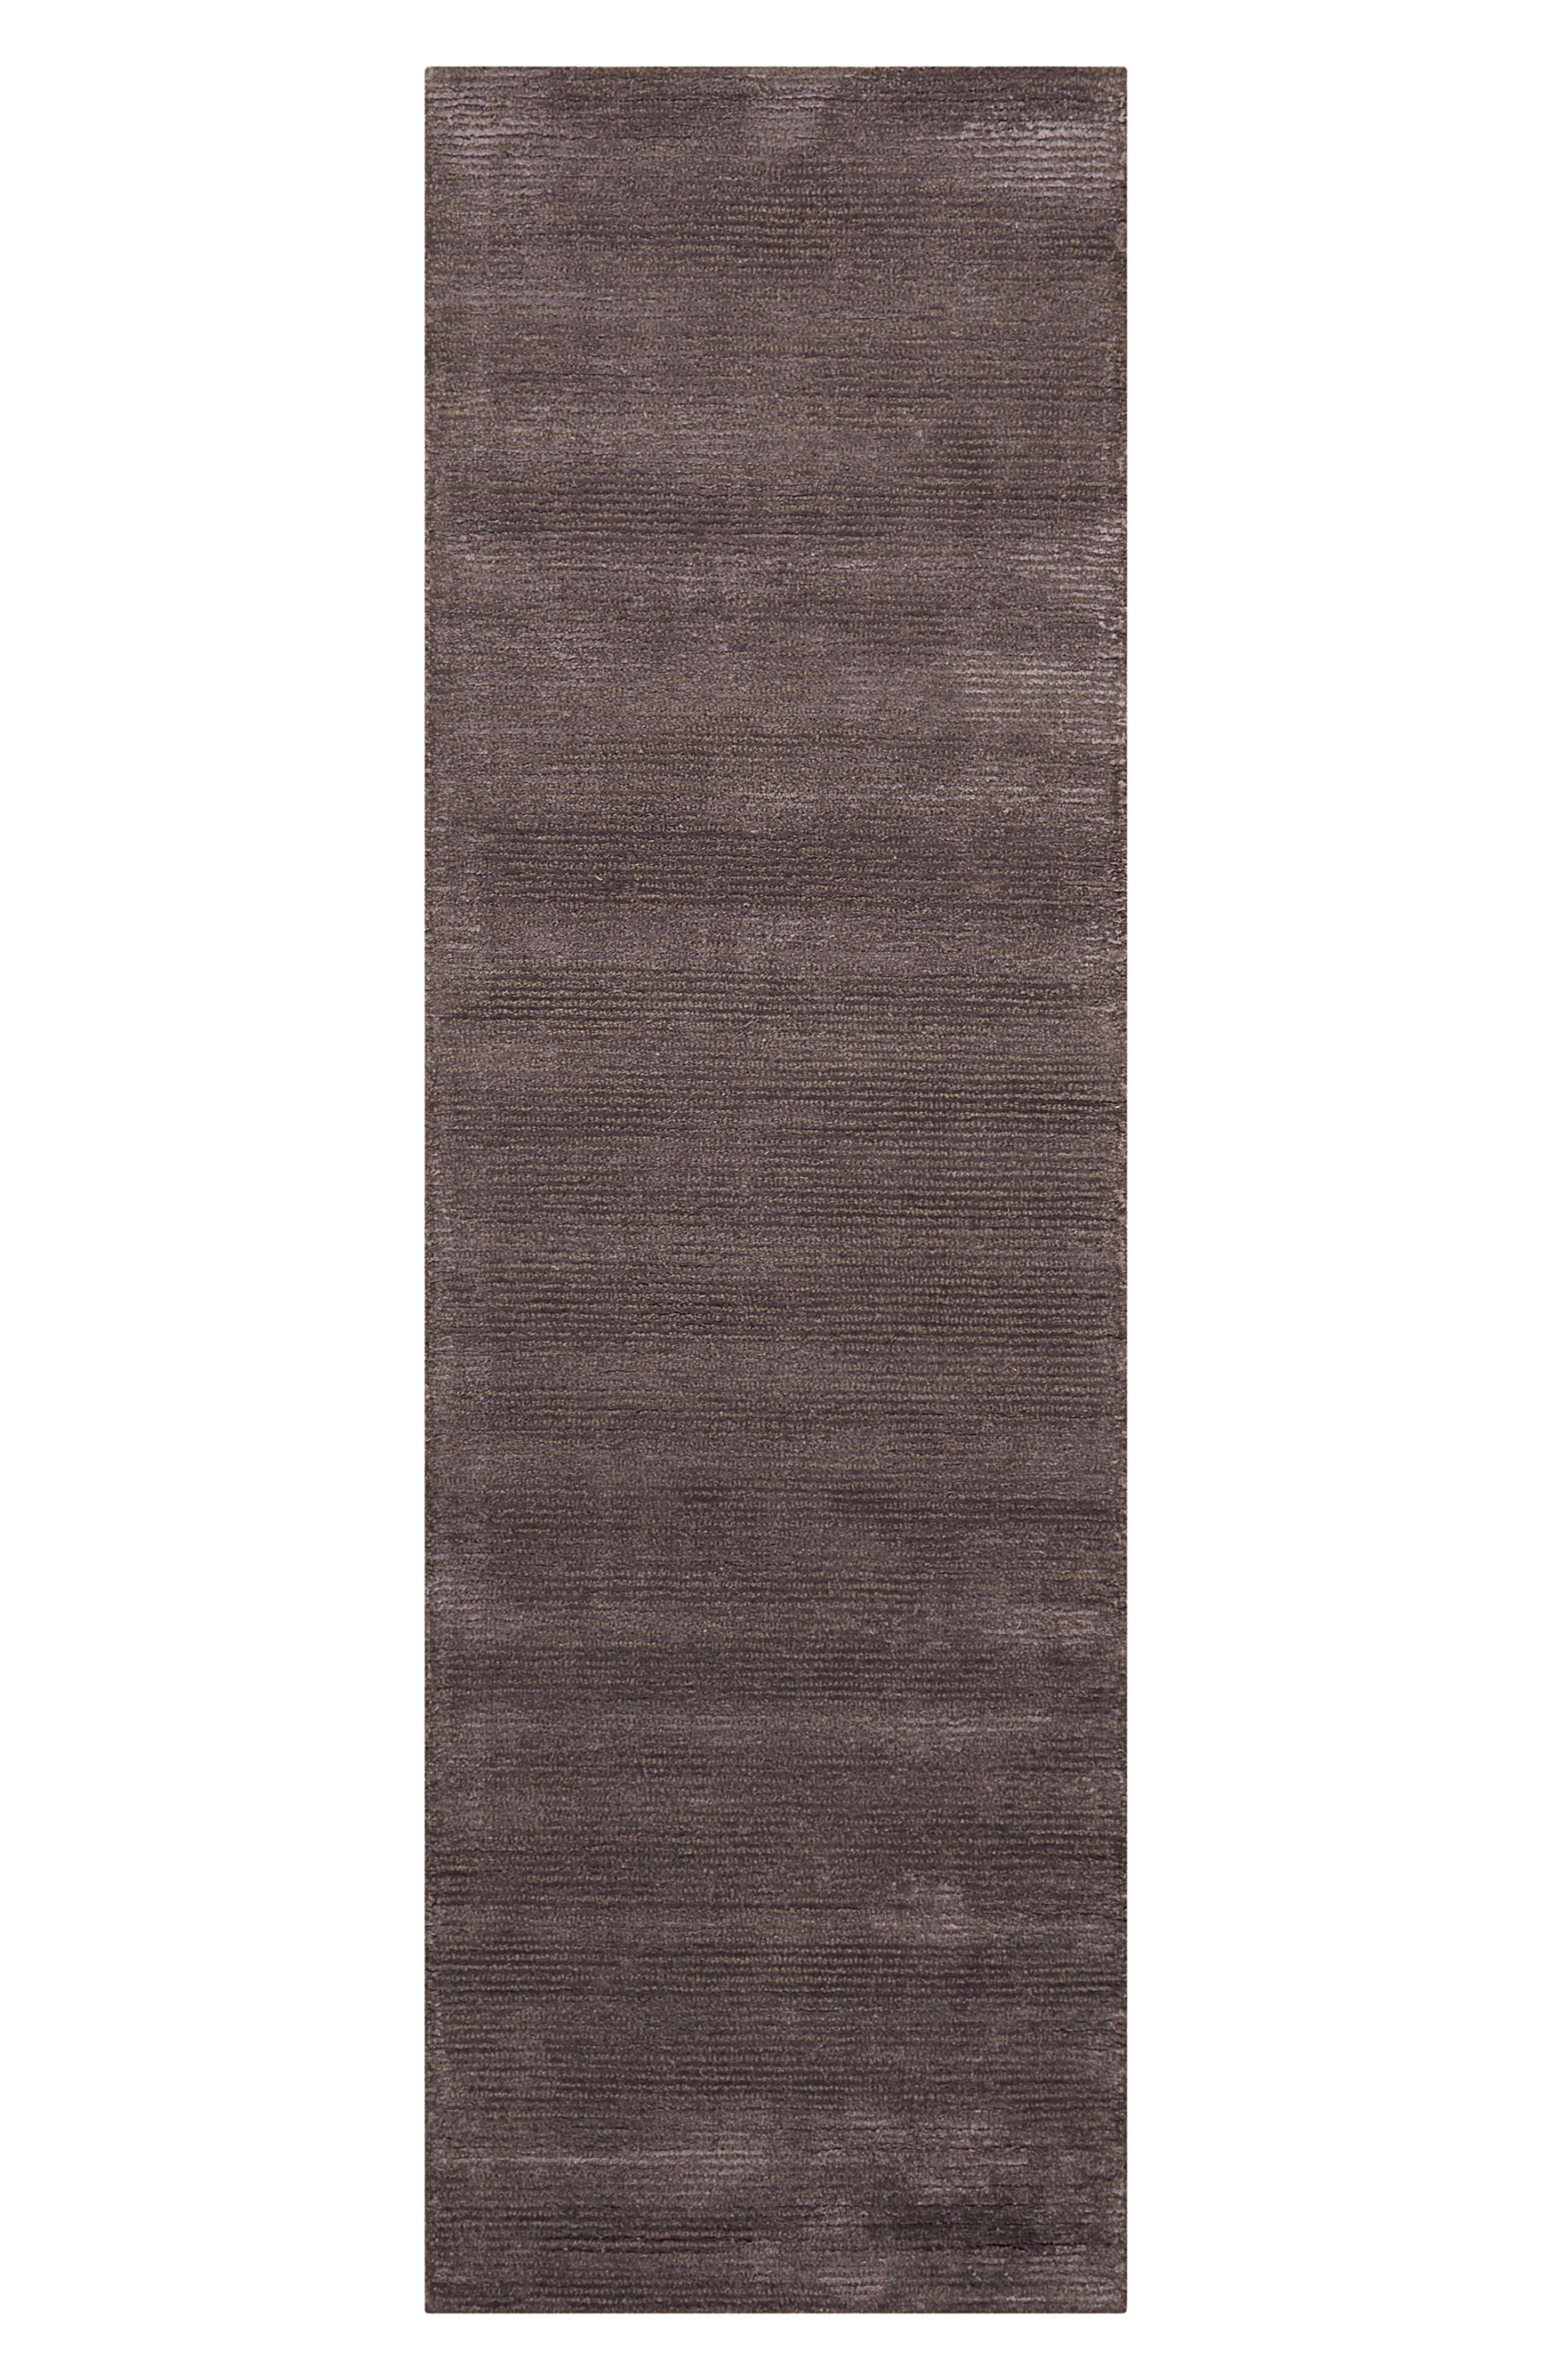 Ravine Furrow Handwoven Area Rug,                             Alternate thumbnail 3, color,                             001